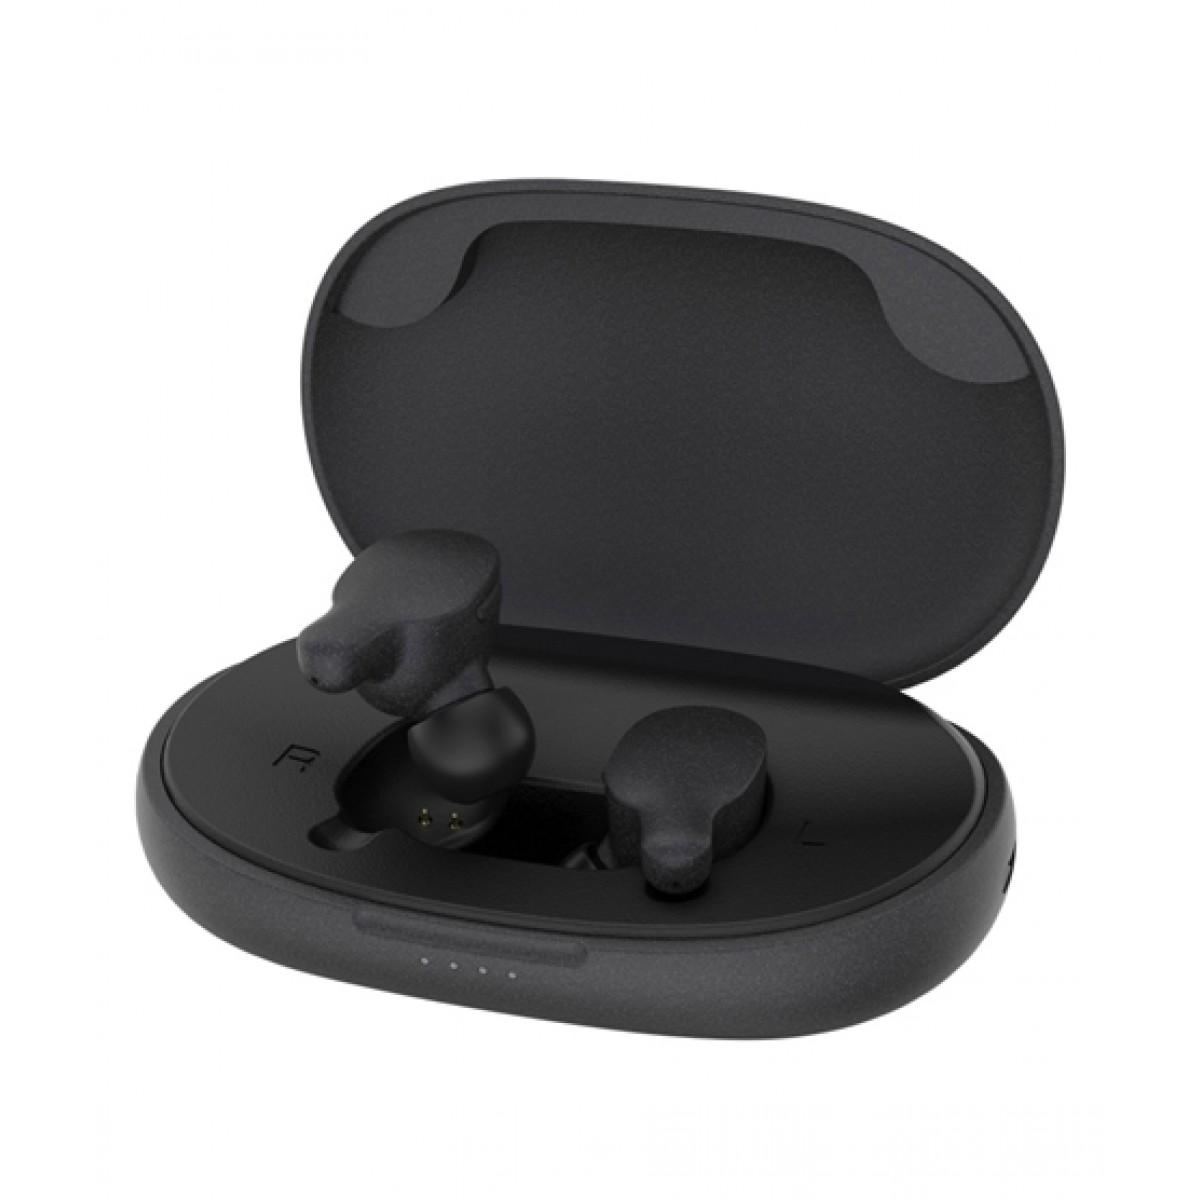 Remax TWS-3 Wireless Bluetooth Earbuds Black